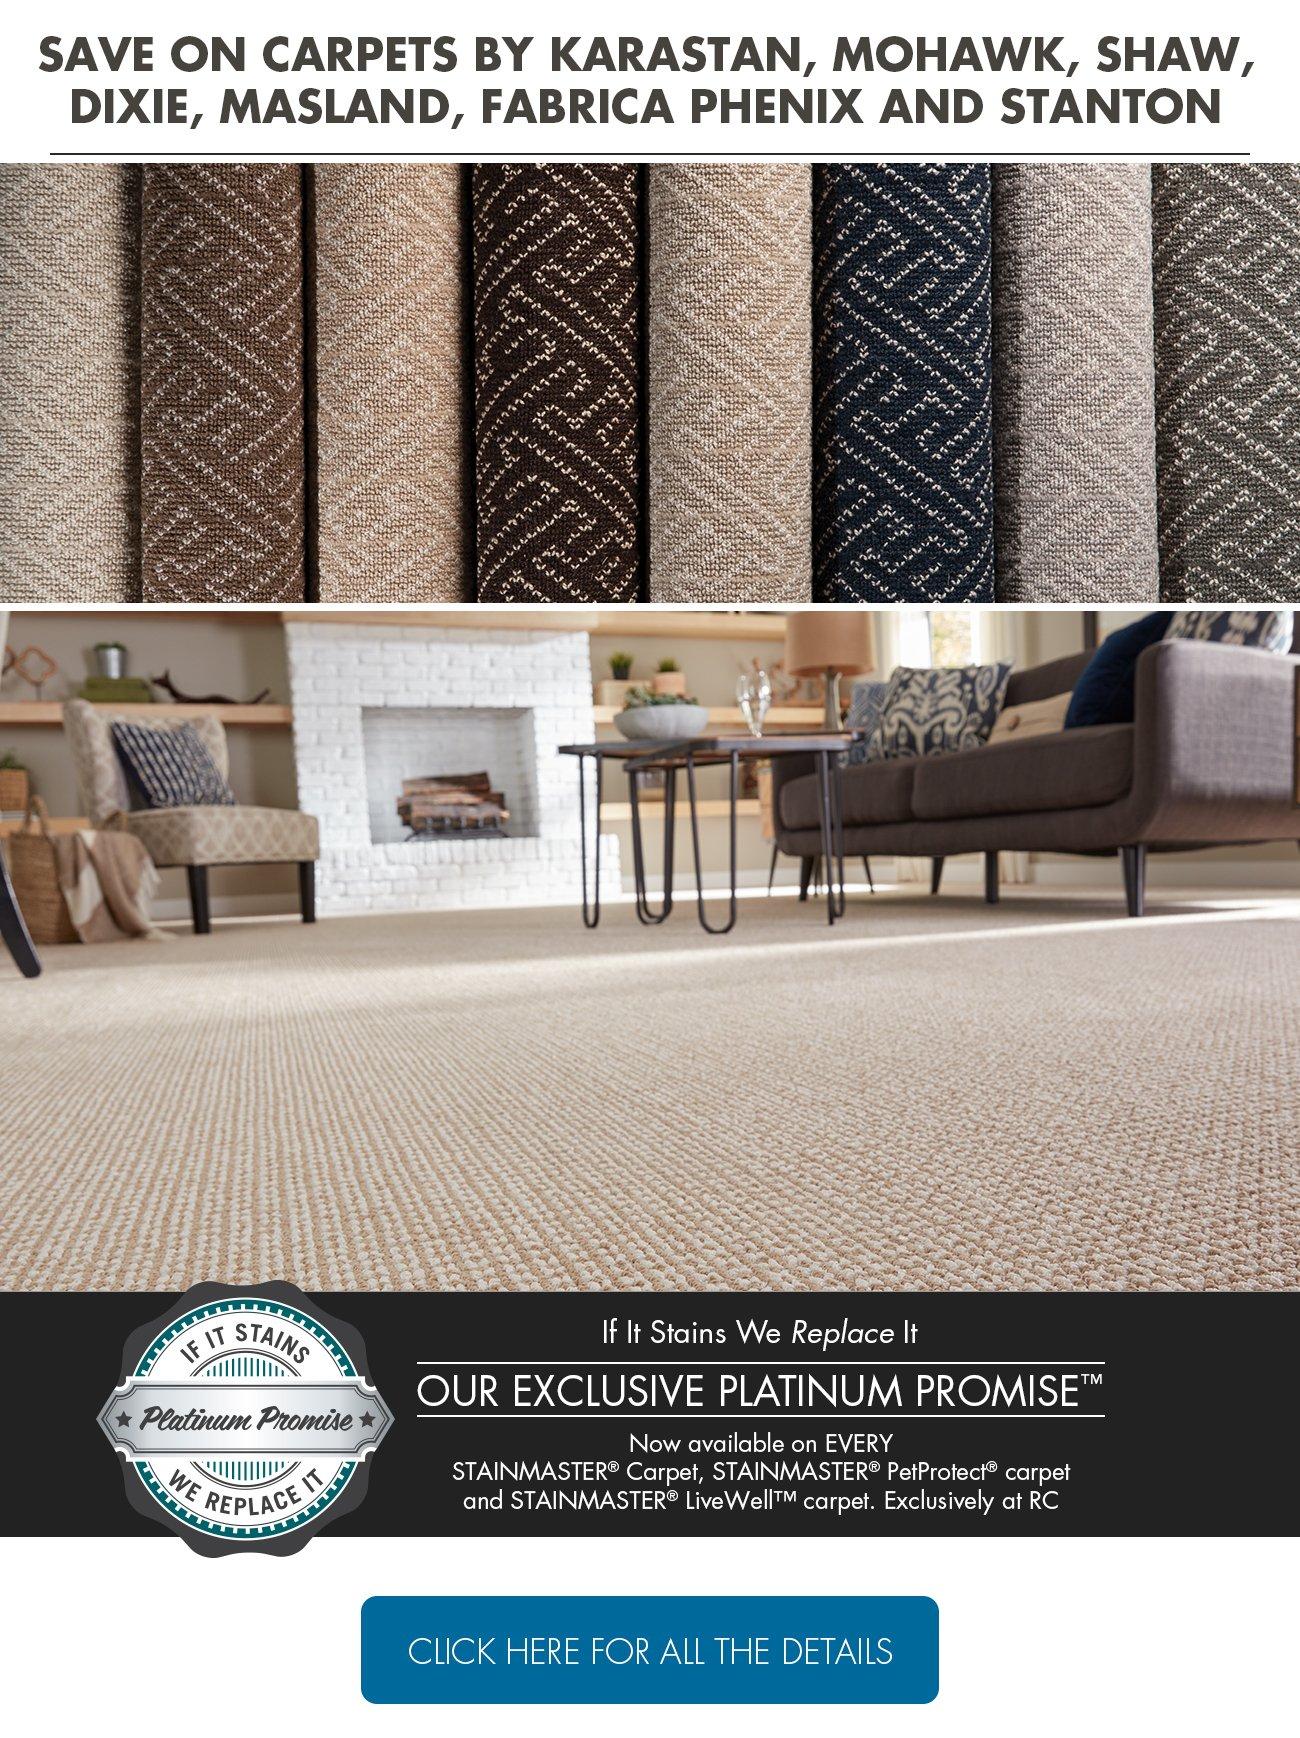 Save on carpets by Karastan, Mohawk, Shaw, Dixie, Masland, Fabrica Phenix and Stanton